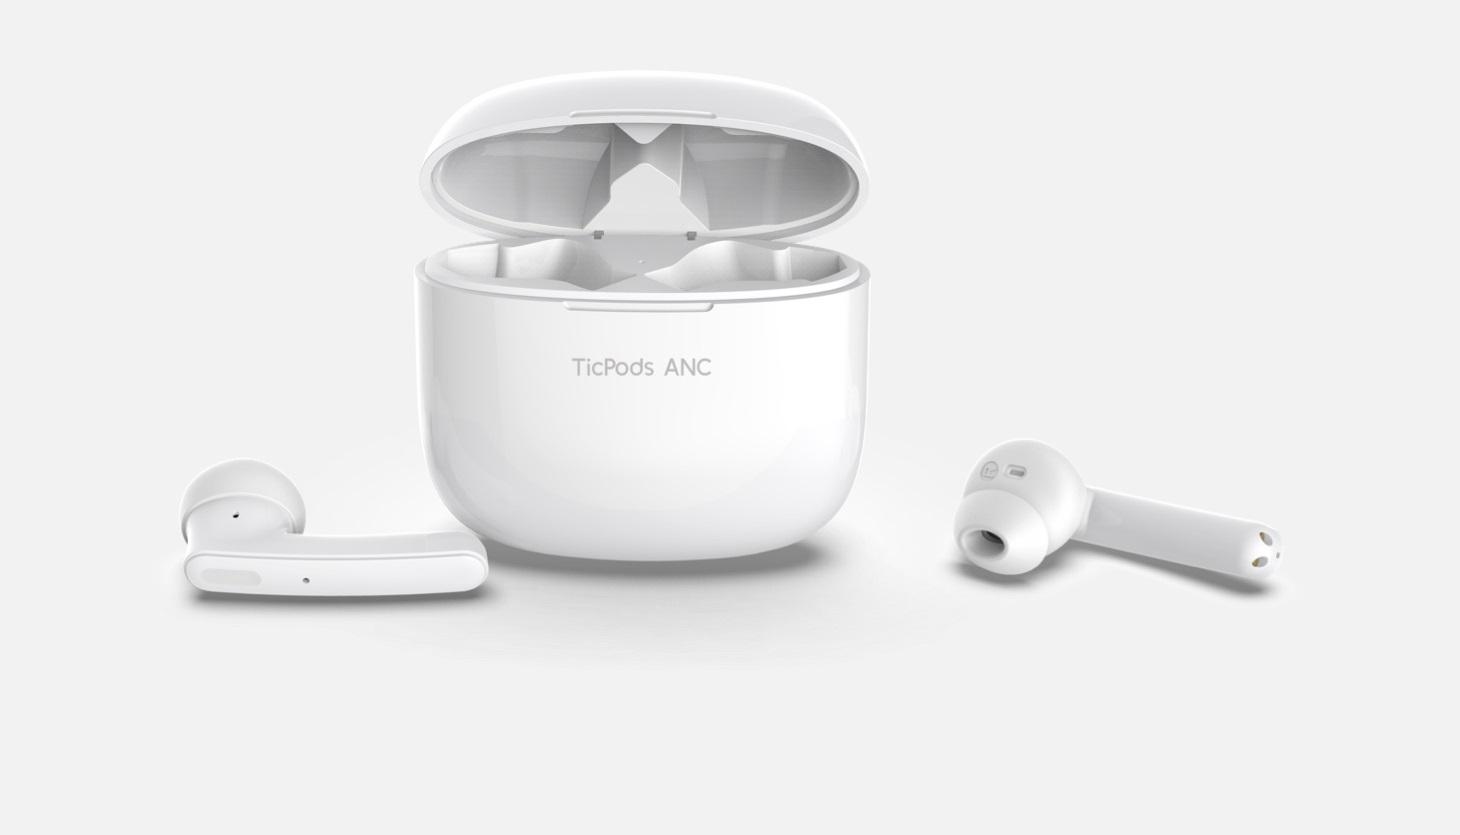 Mobvoi TicPods ANC TWS earbuds